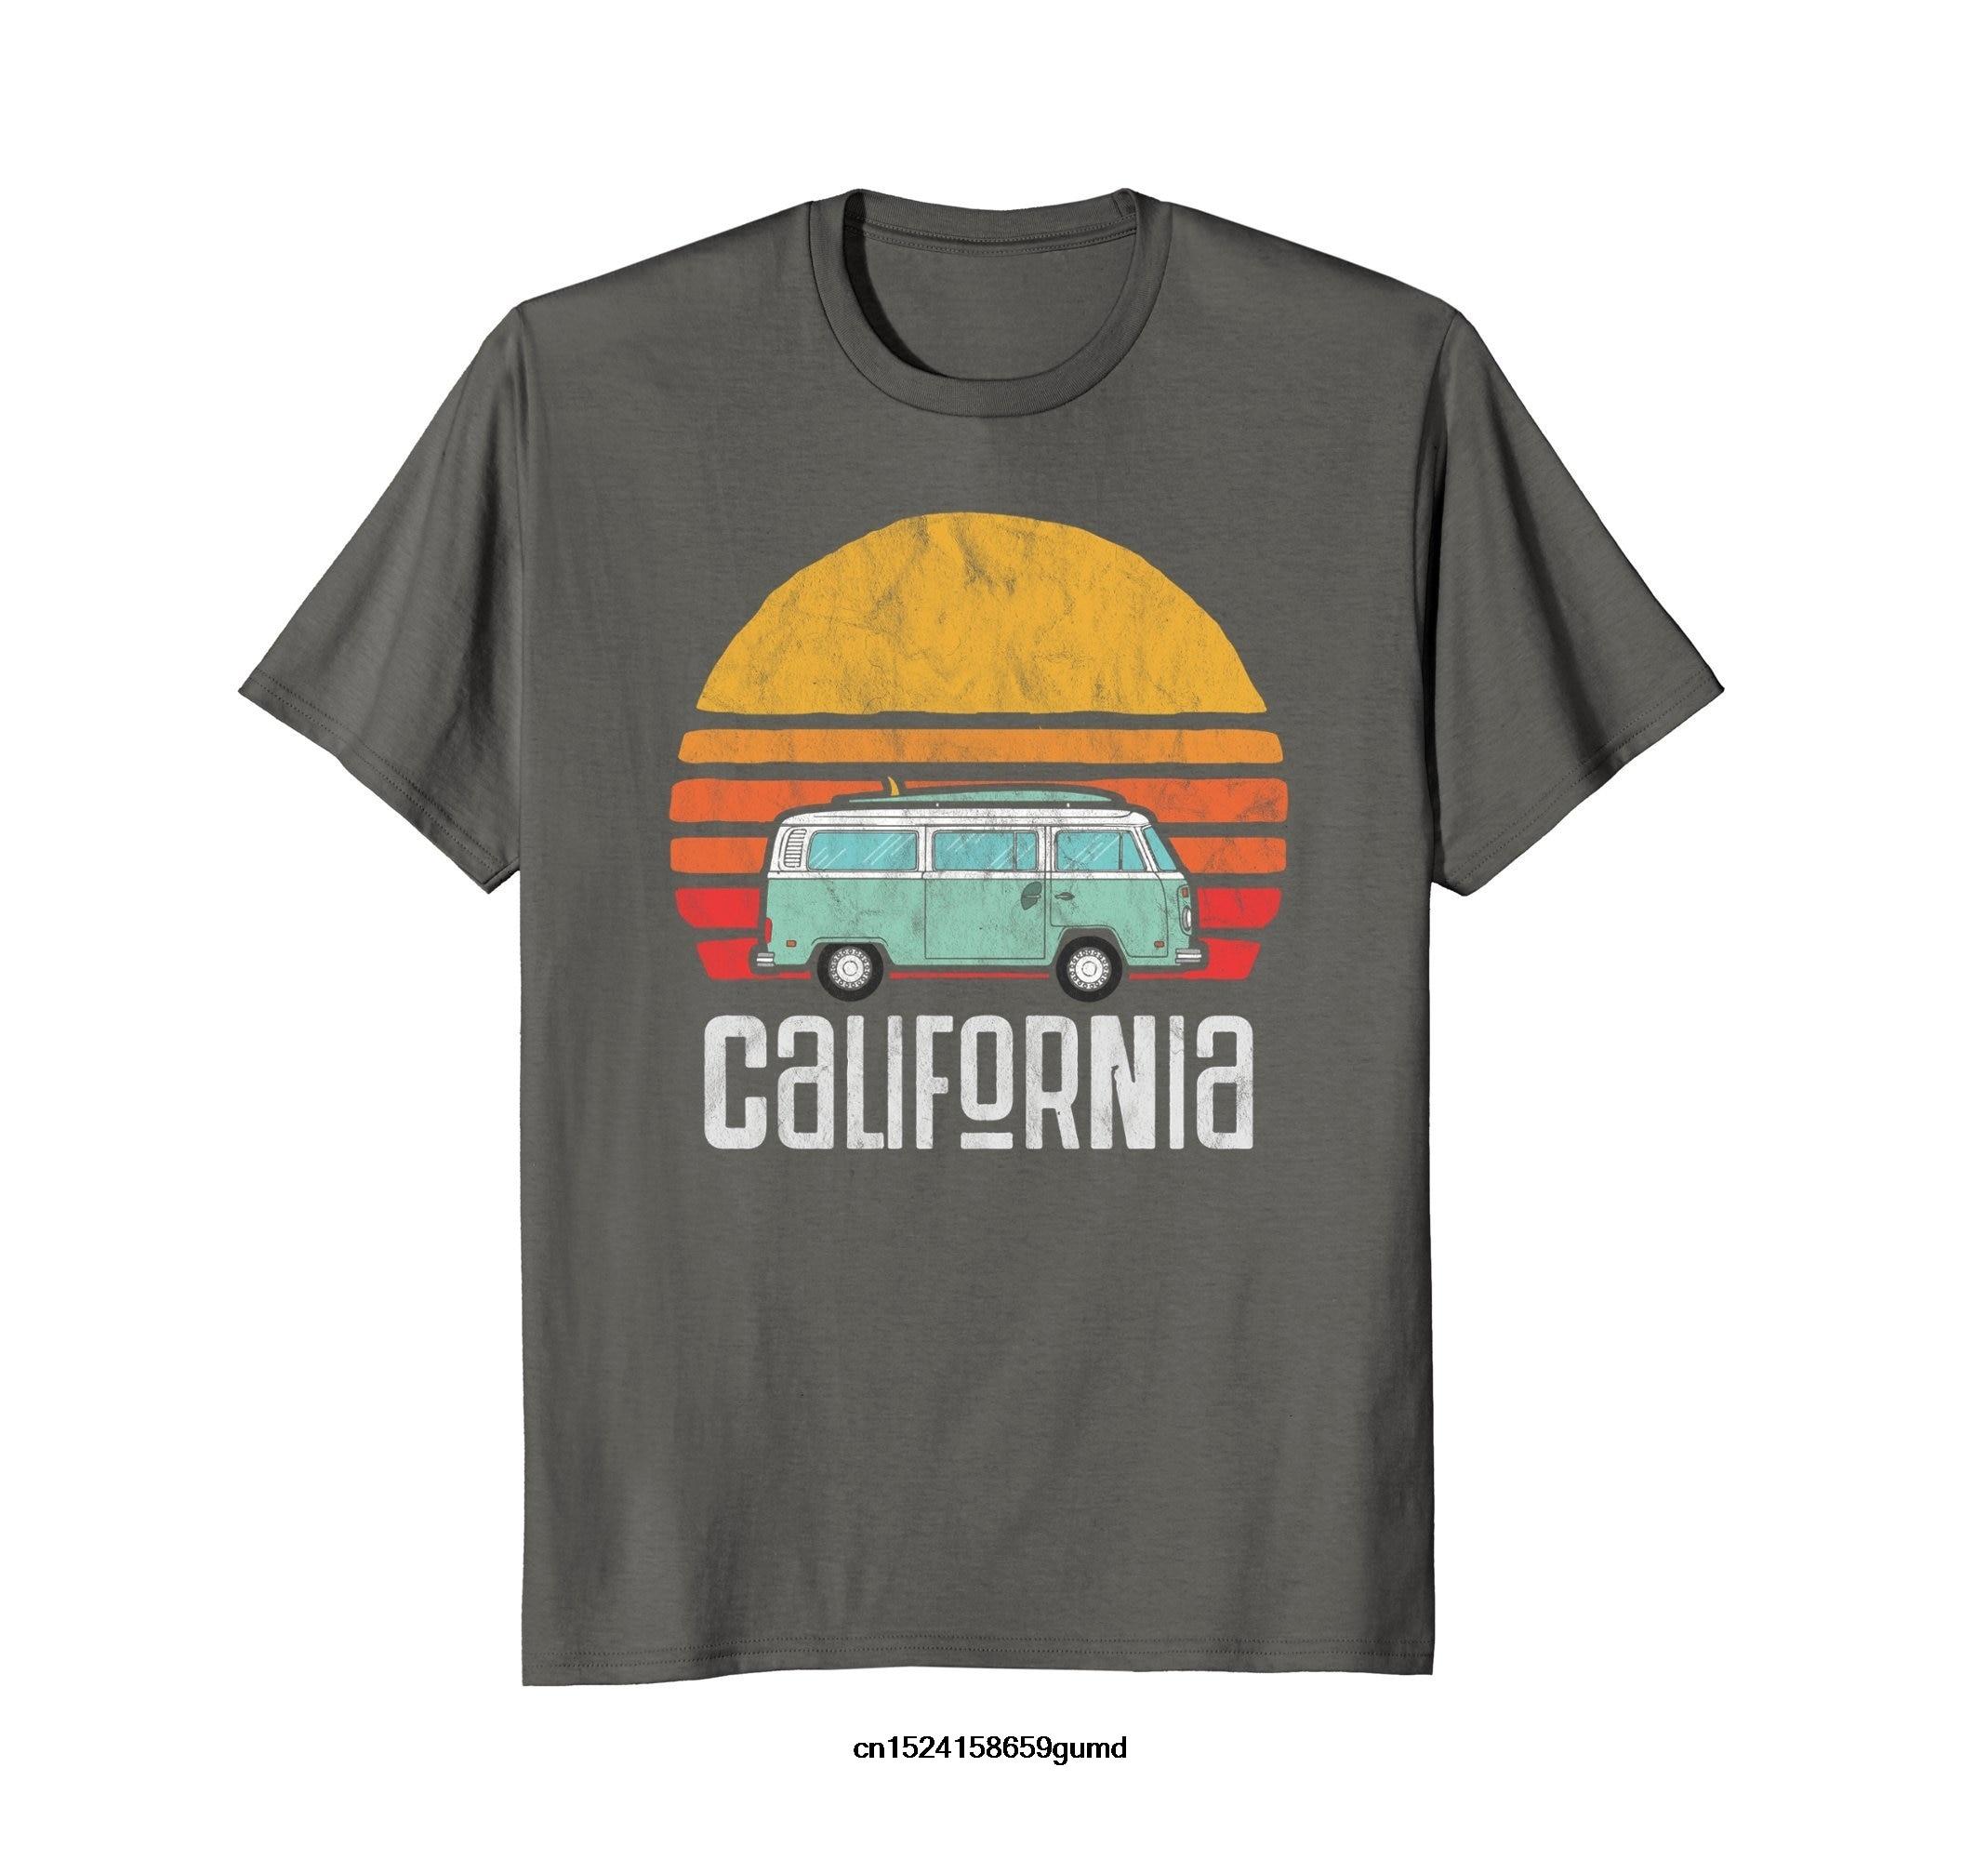 Funny Men T Shirt Women Novelty Tshirt Retro California Hippie Van Beach Bum Surfer T-Shirt